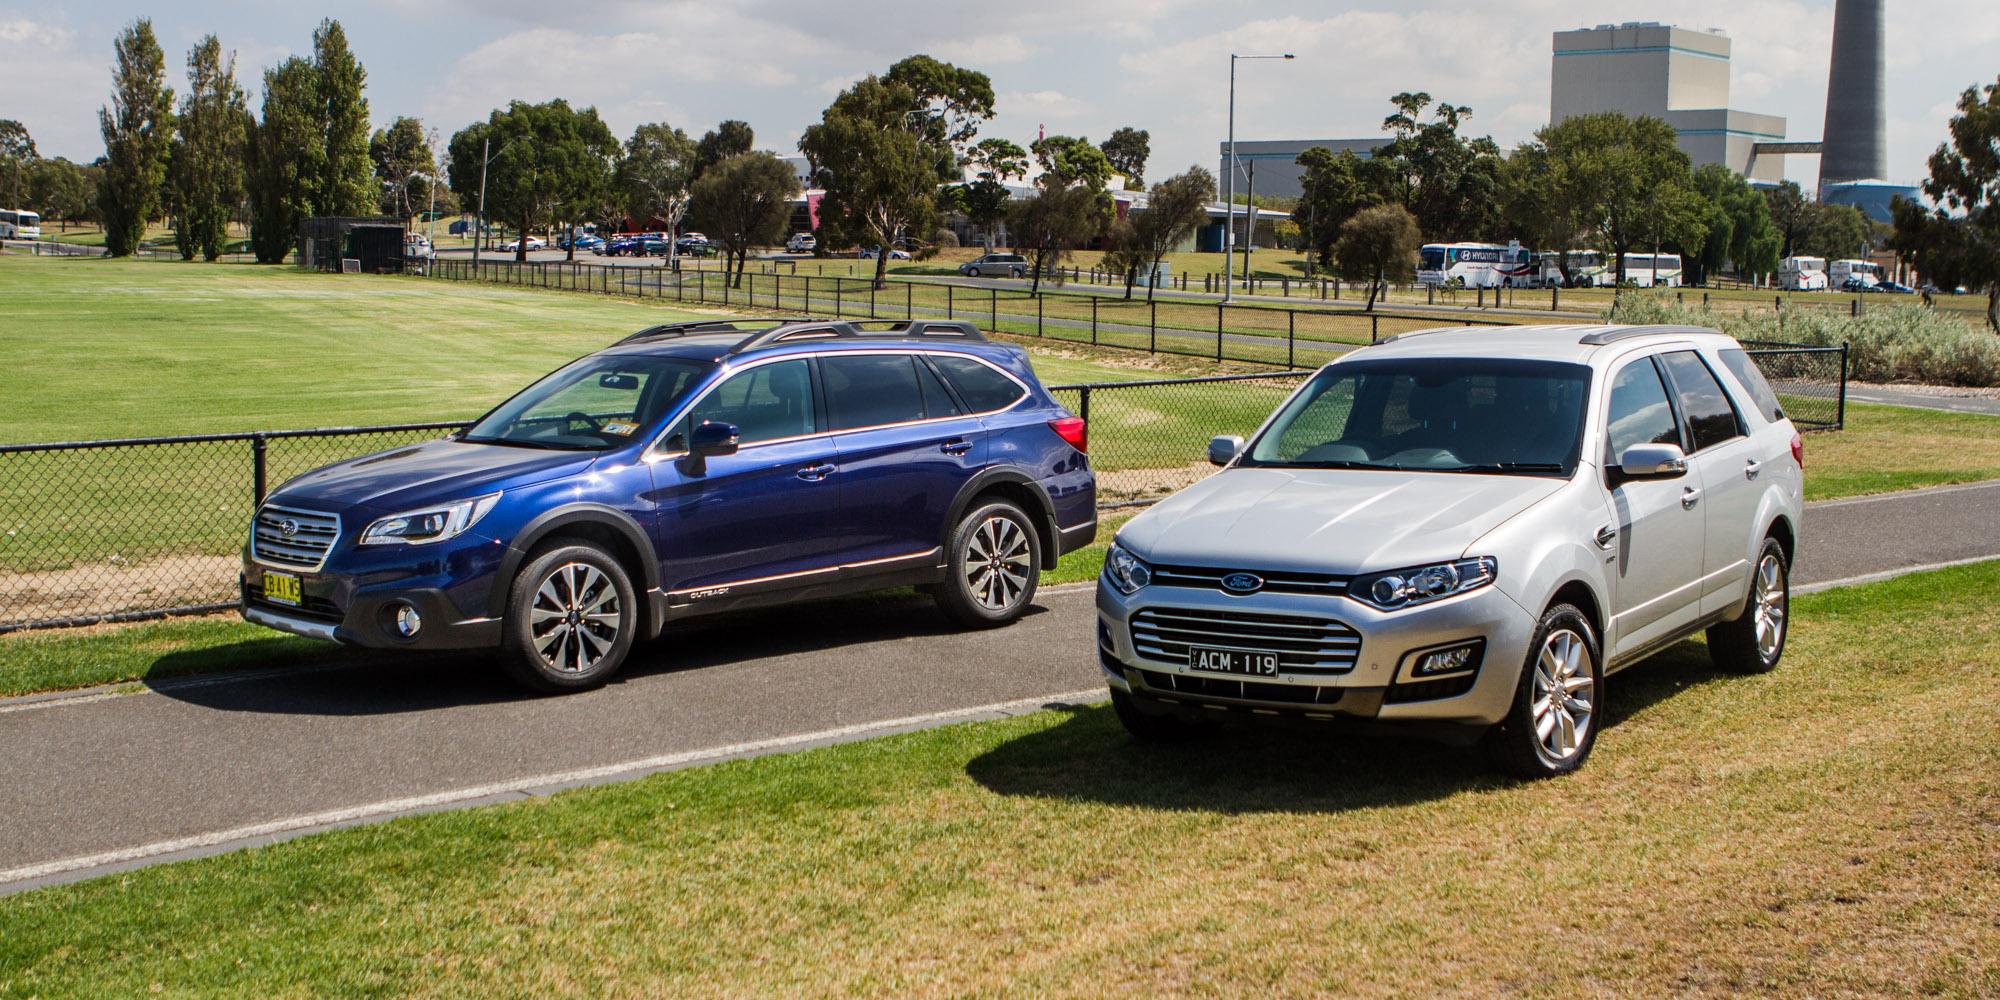 Ford Territory TS sel v Subaru Outback 2 0D Premium parison